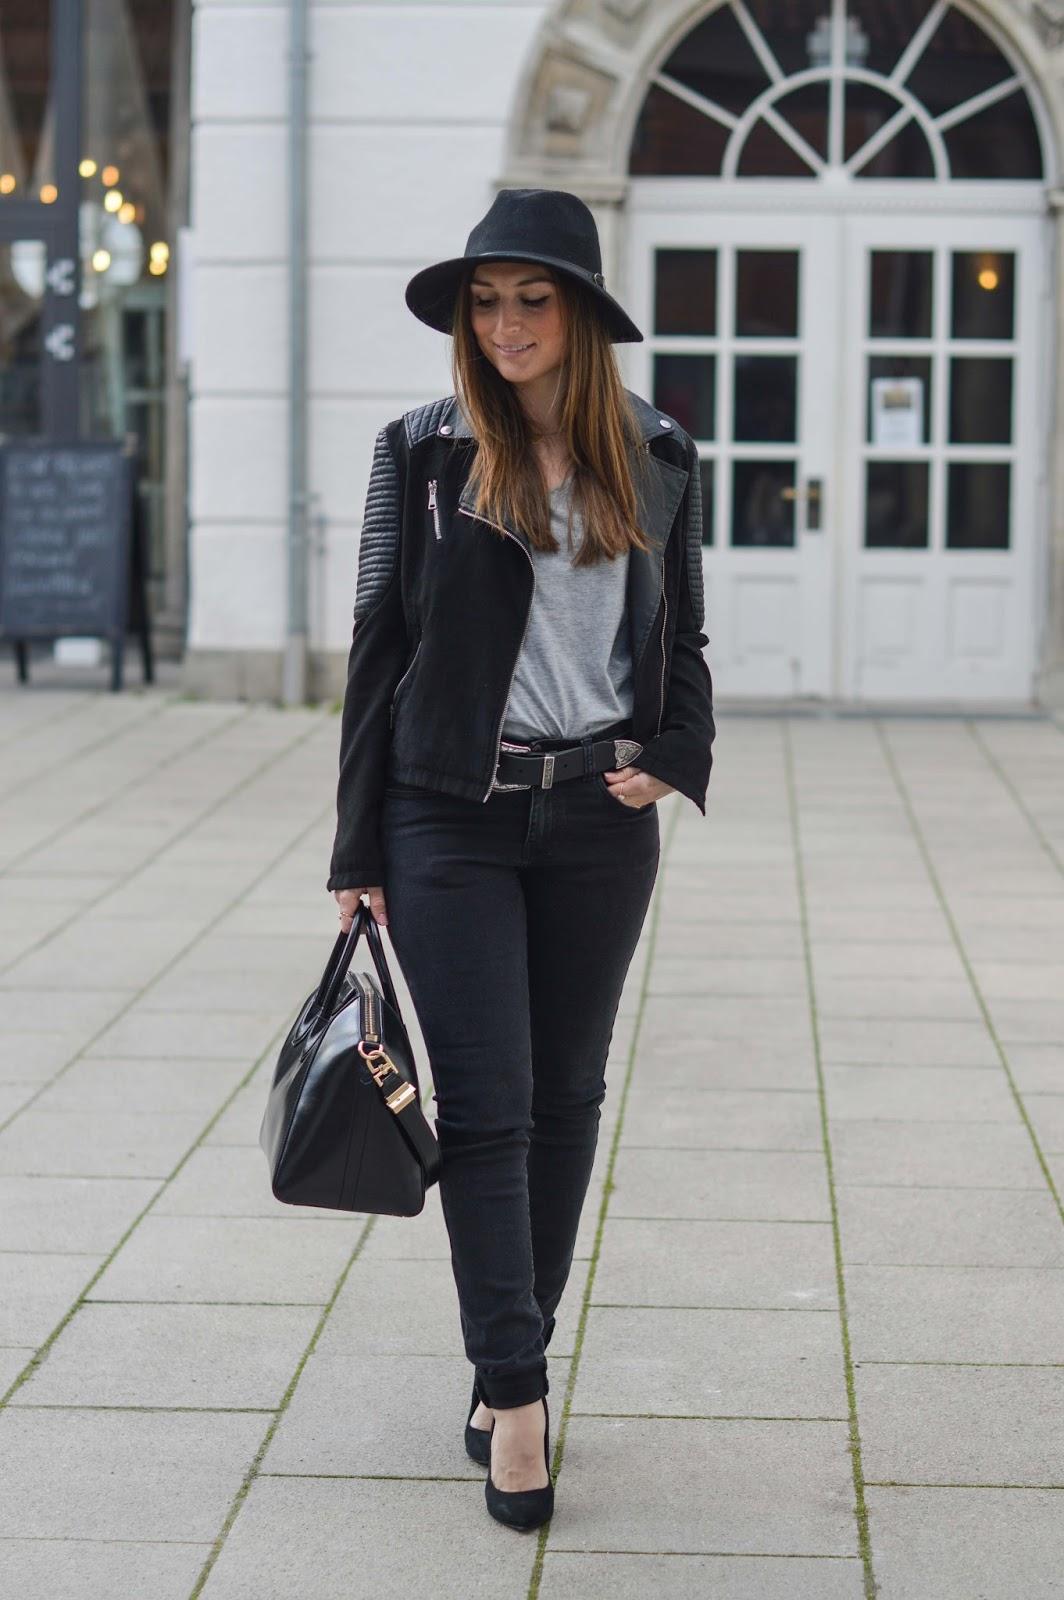 Givenchy Tasche - Streetstyle -Kendall Jenner - Skynnie Jeans - Lederjacke - Fashionstylebyjohanna